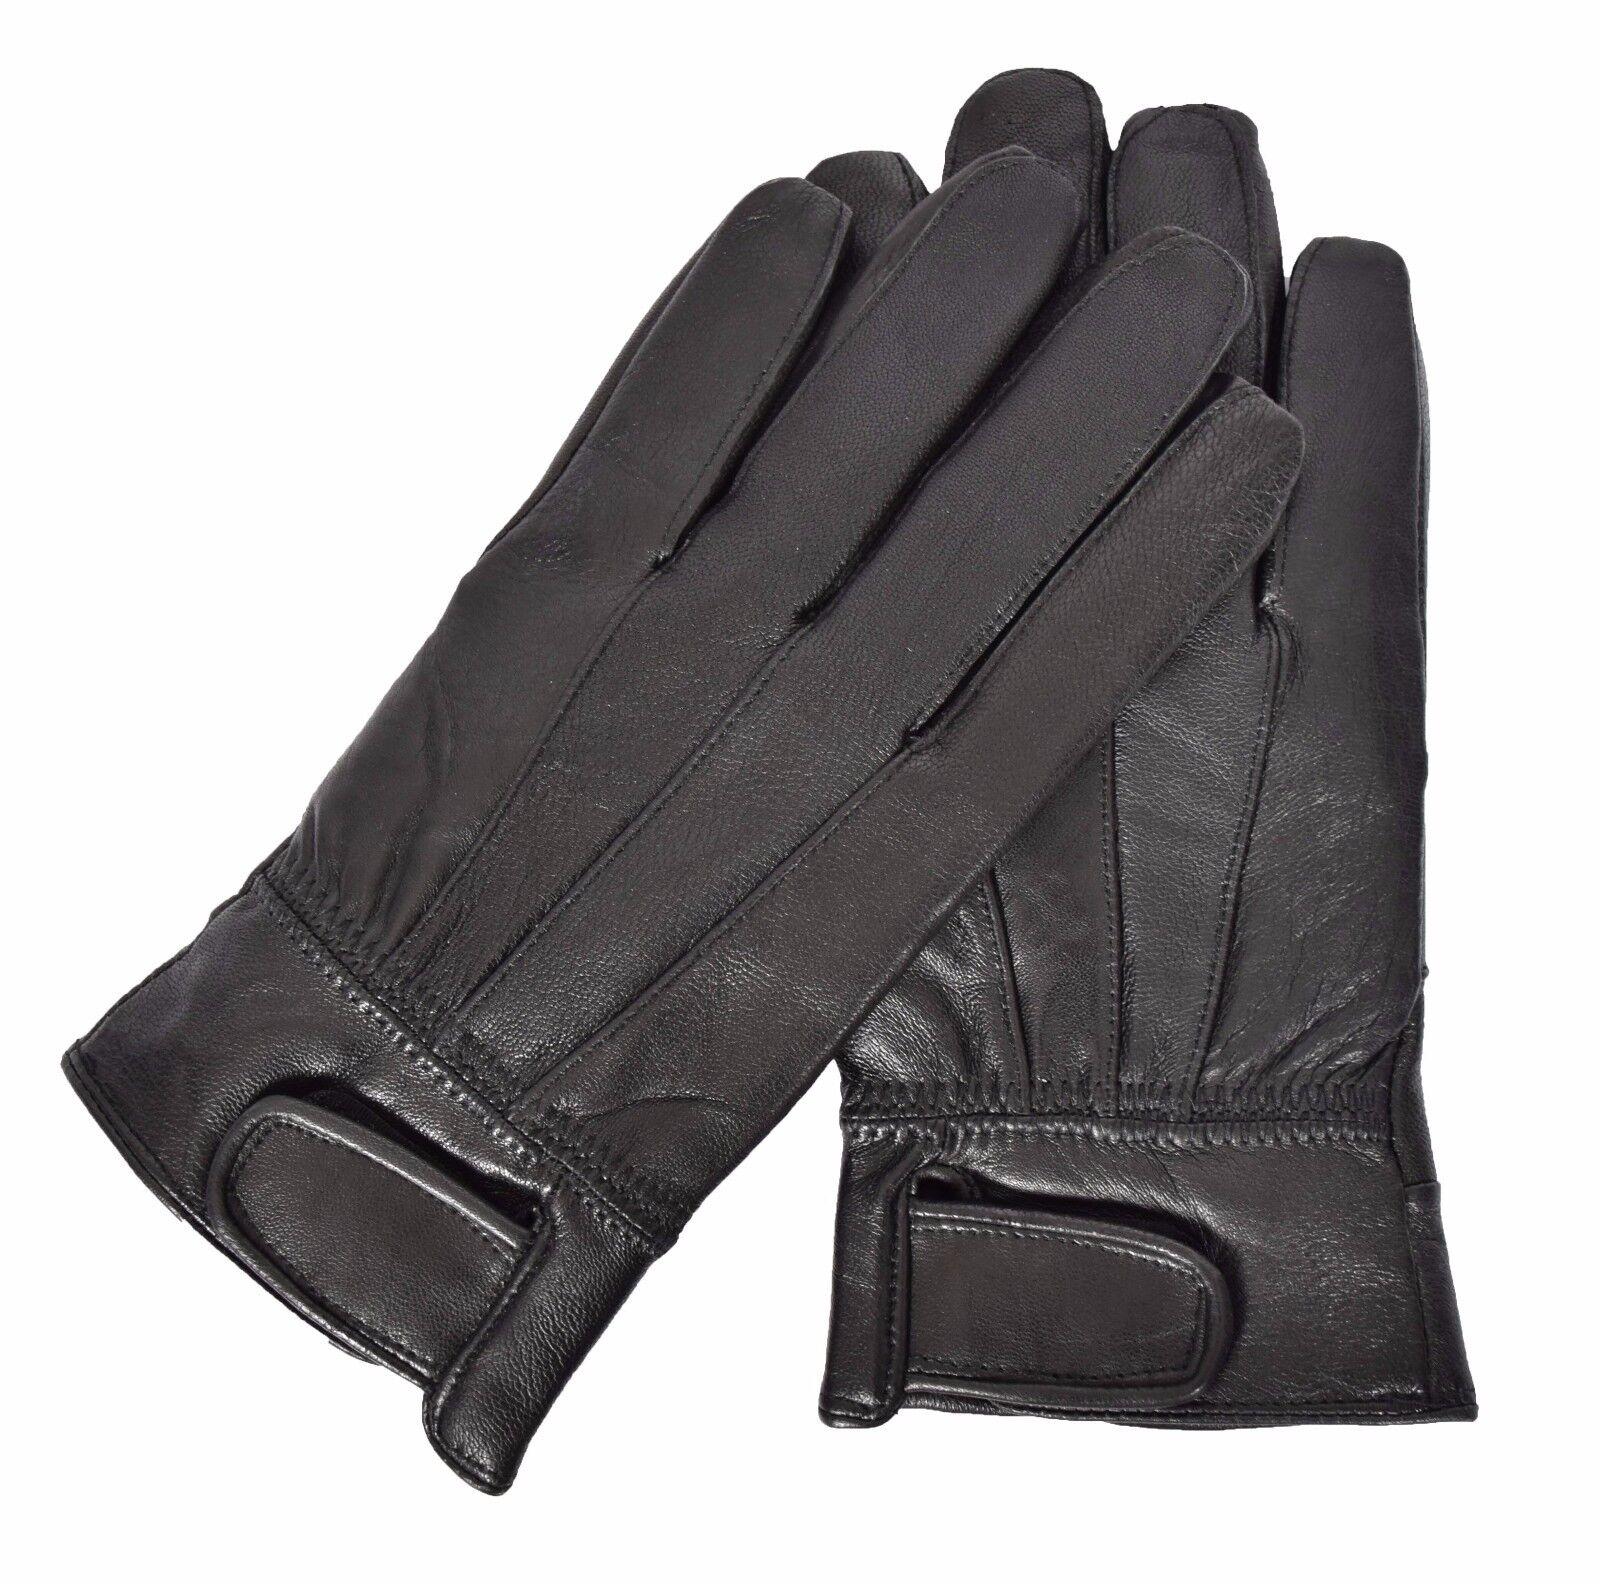 Mens soft black genuine leather gloves fleece lined warm winter gloves Josh NEW